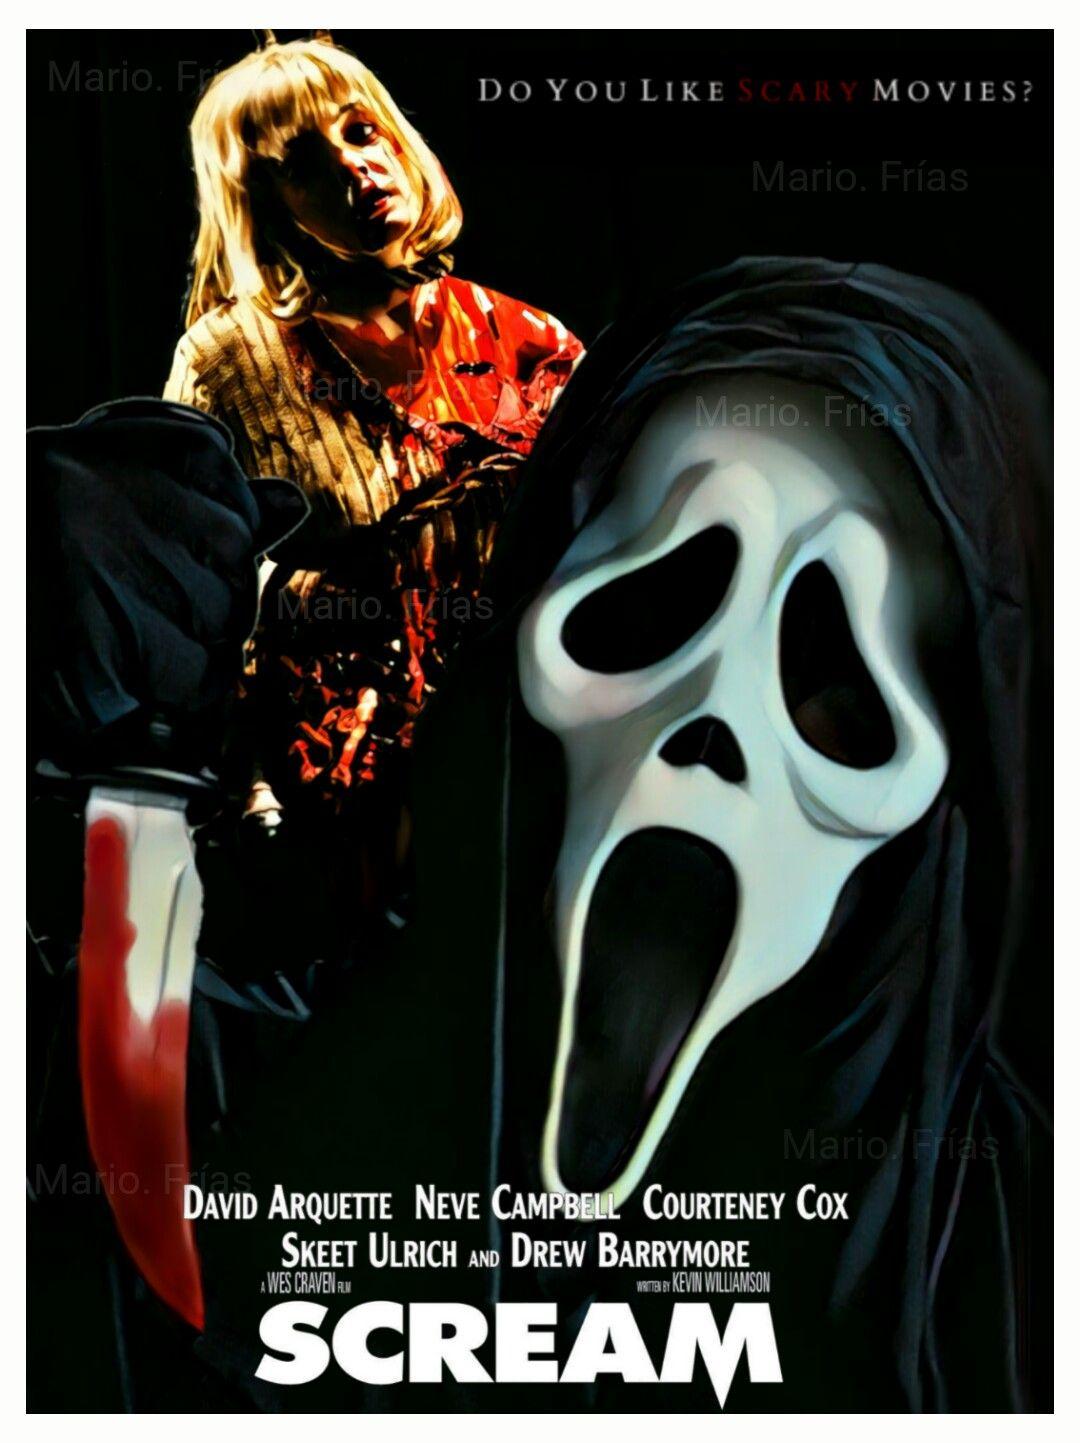 scream 1996 edit by mario fr237as movie posters sci fi